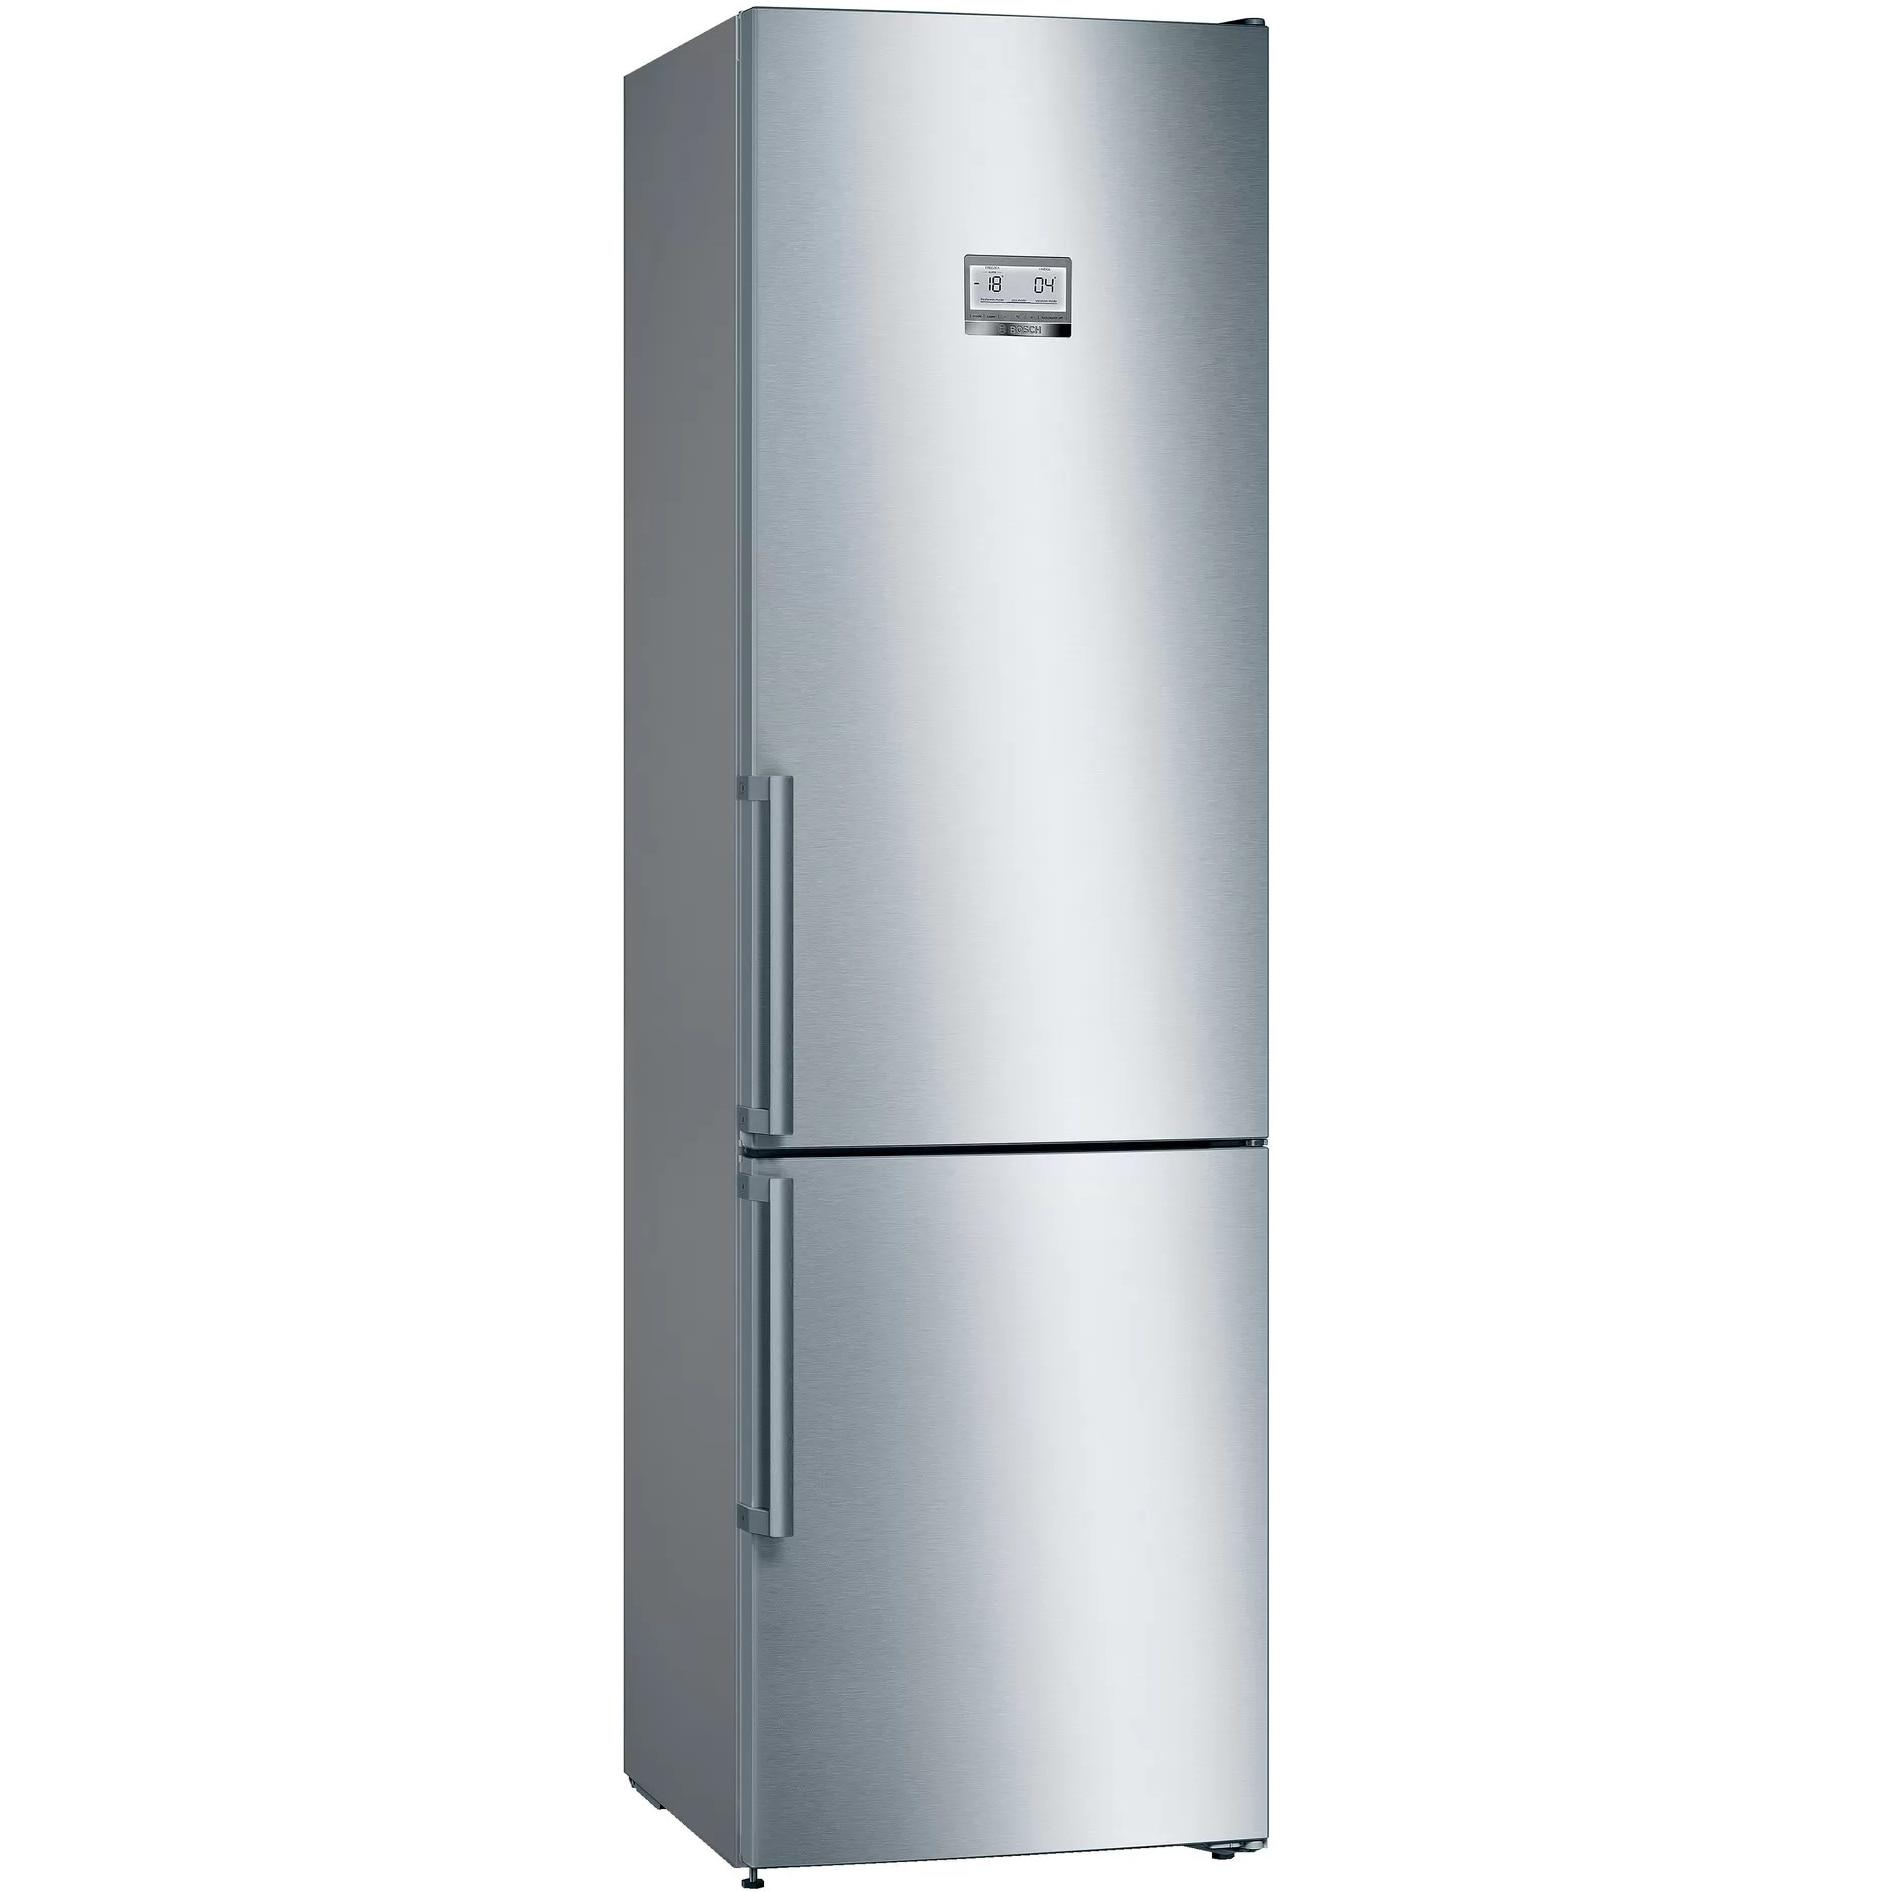 Fotografie Combina frigorifica Bosch KGN39HIEP, 368 l, Clasa E, NoFrost, VitaFresh, H 204 cm, Inox antiamprenta